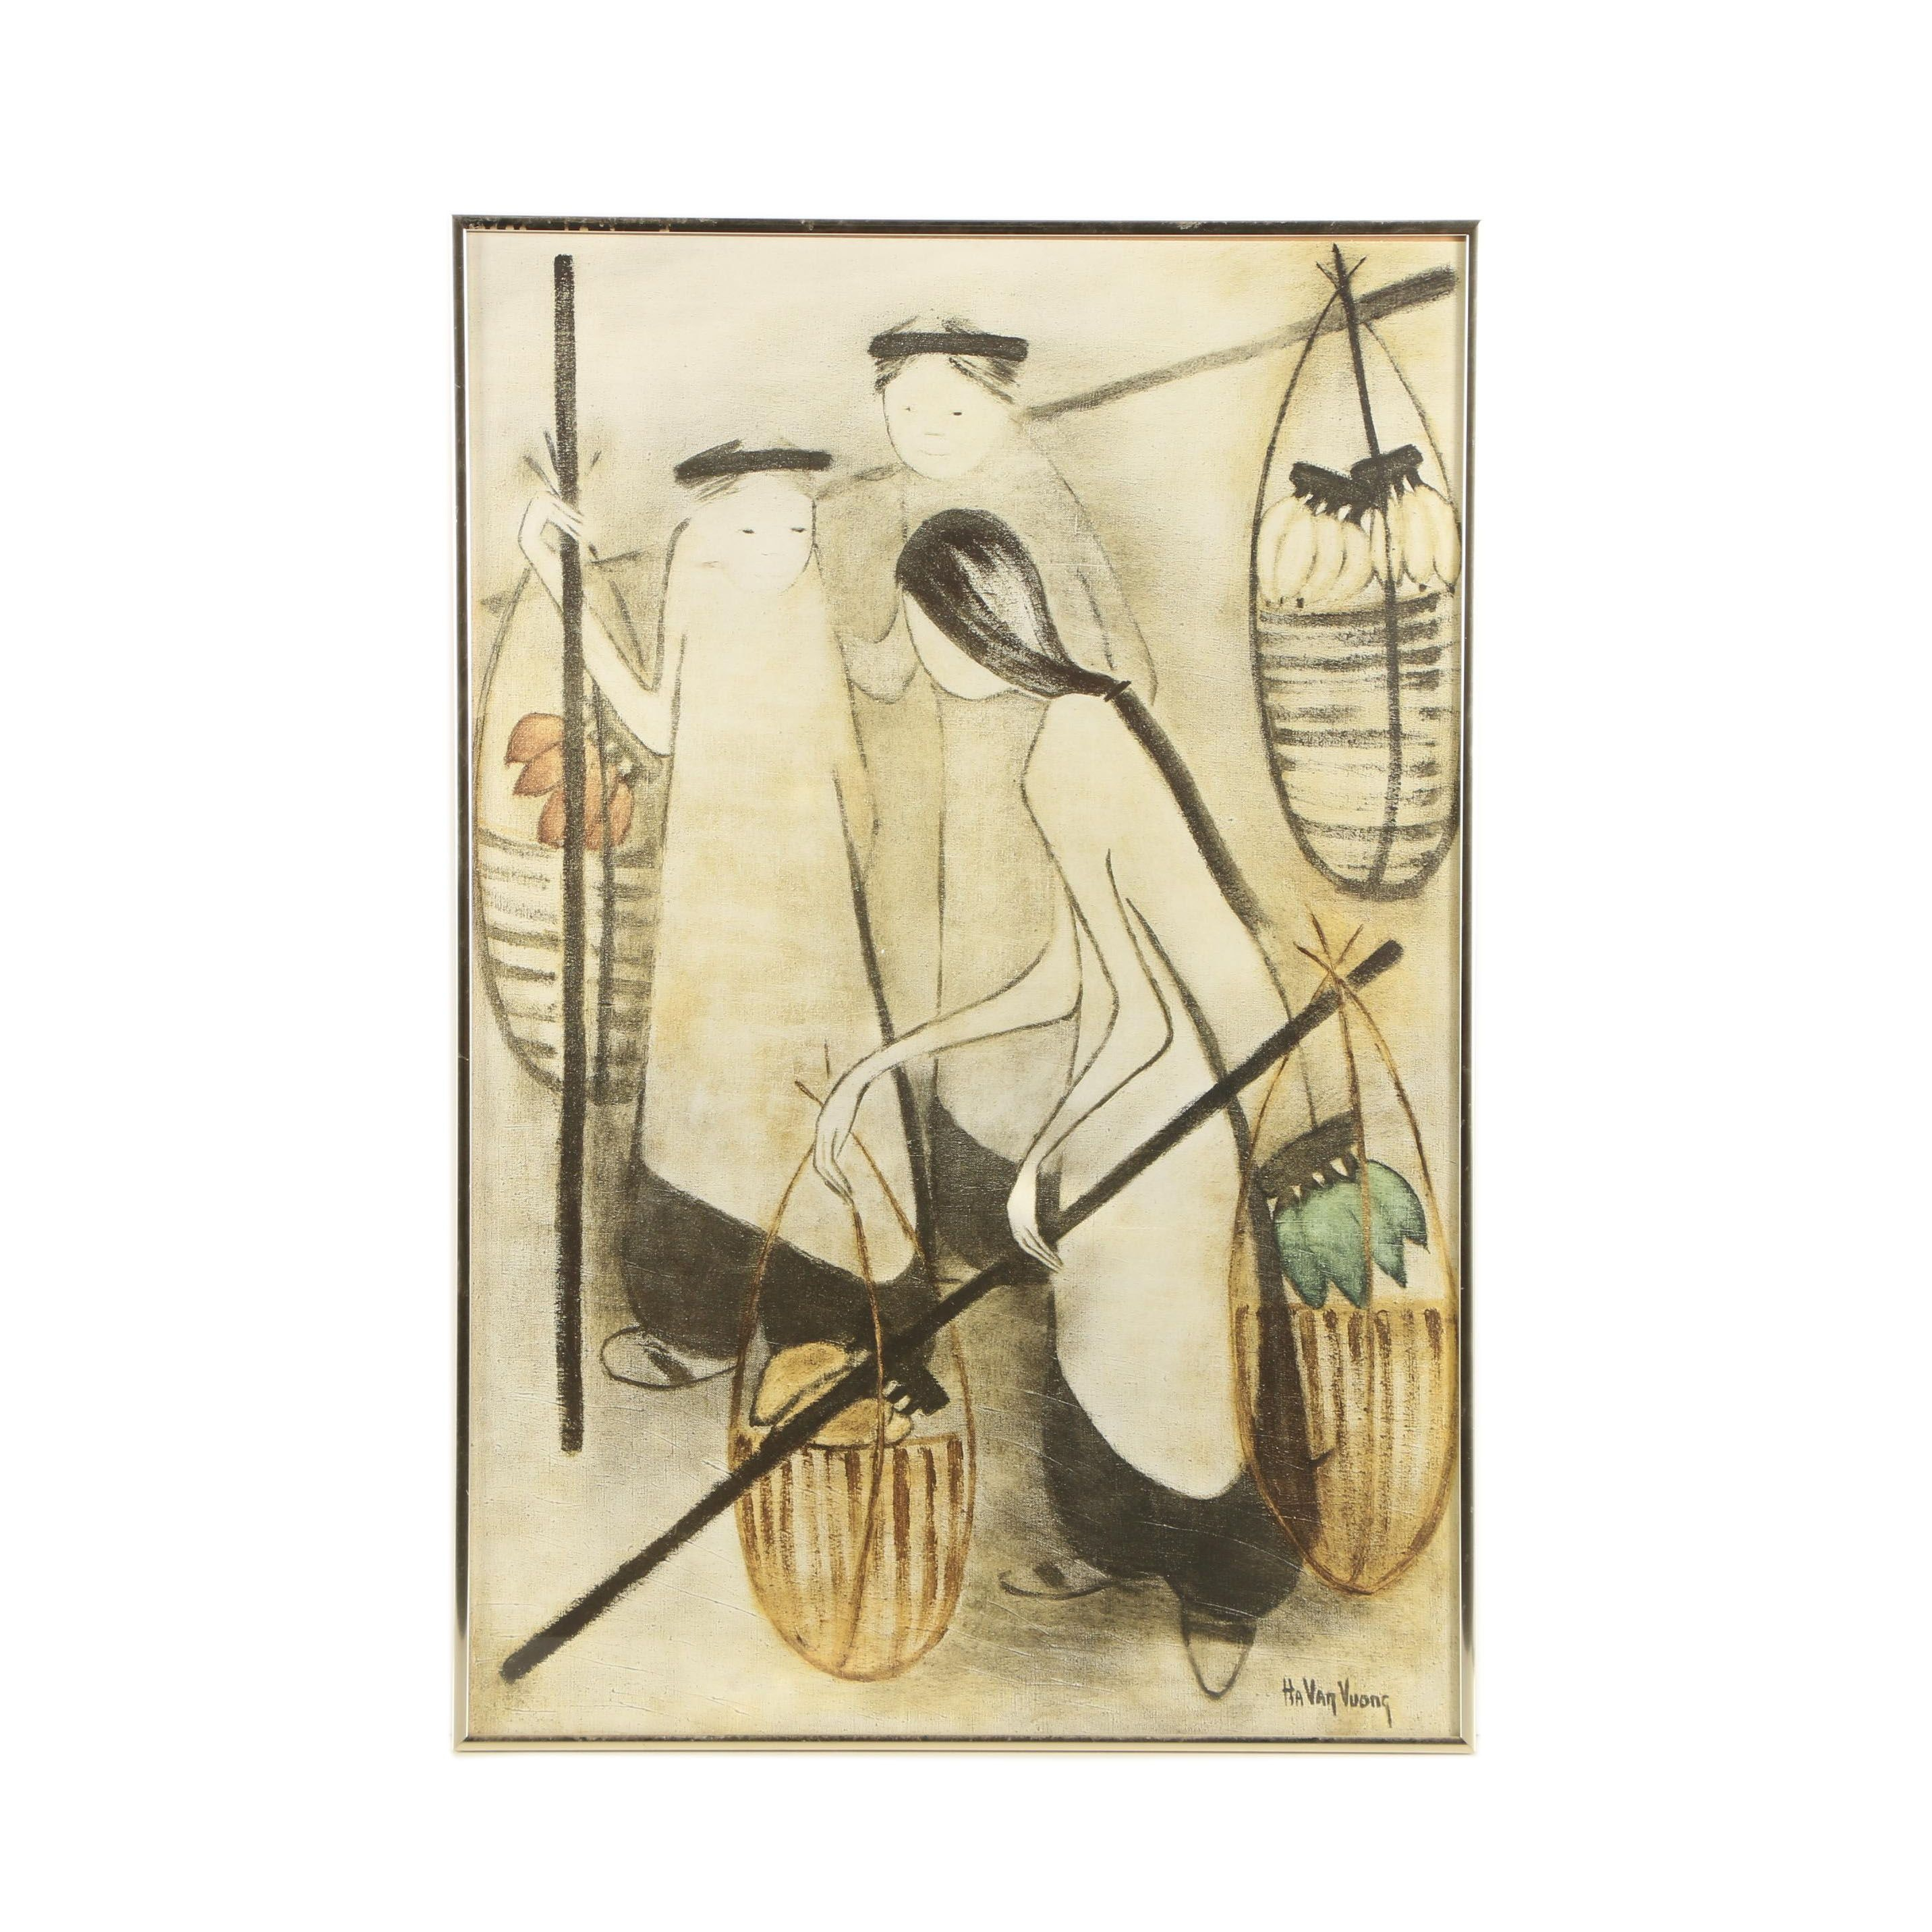 "Halftone Print After Lucienne Ha Van Vuong ""The Banana Sellers"""